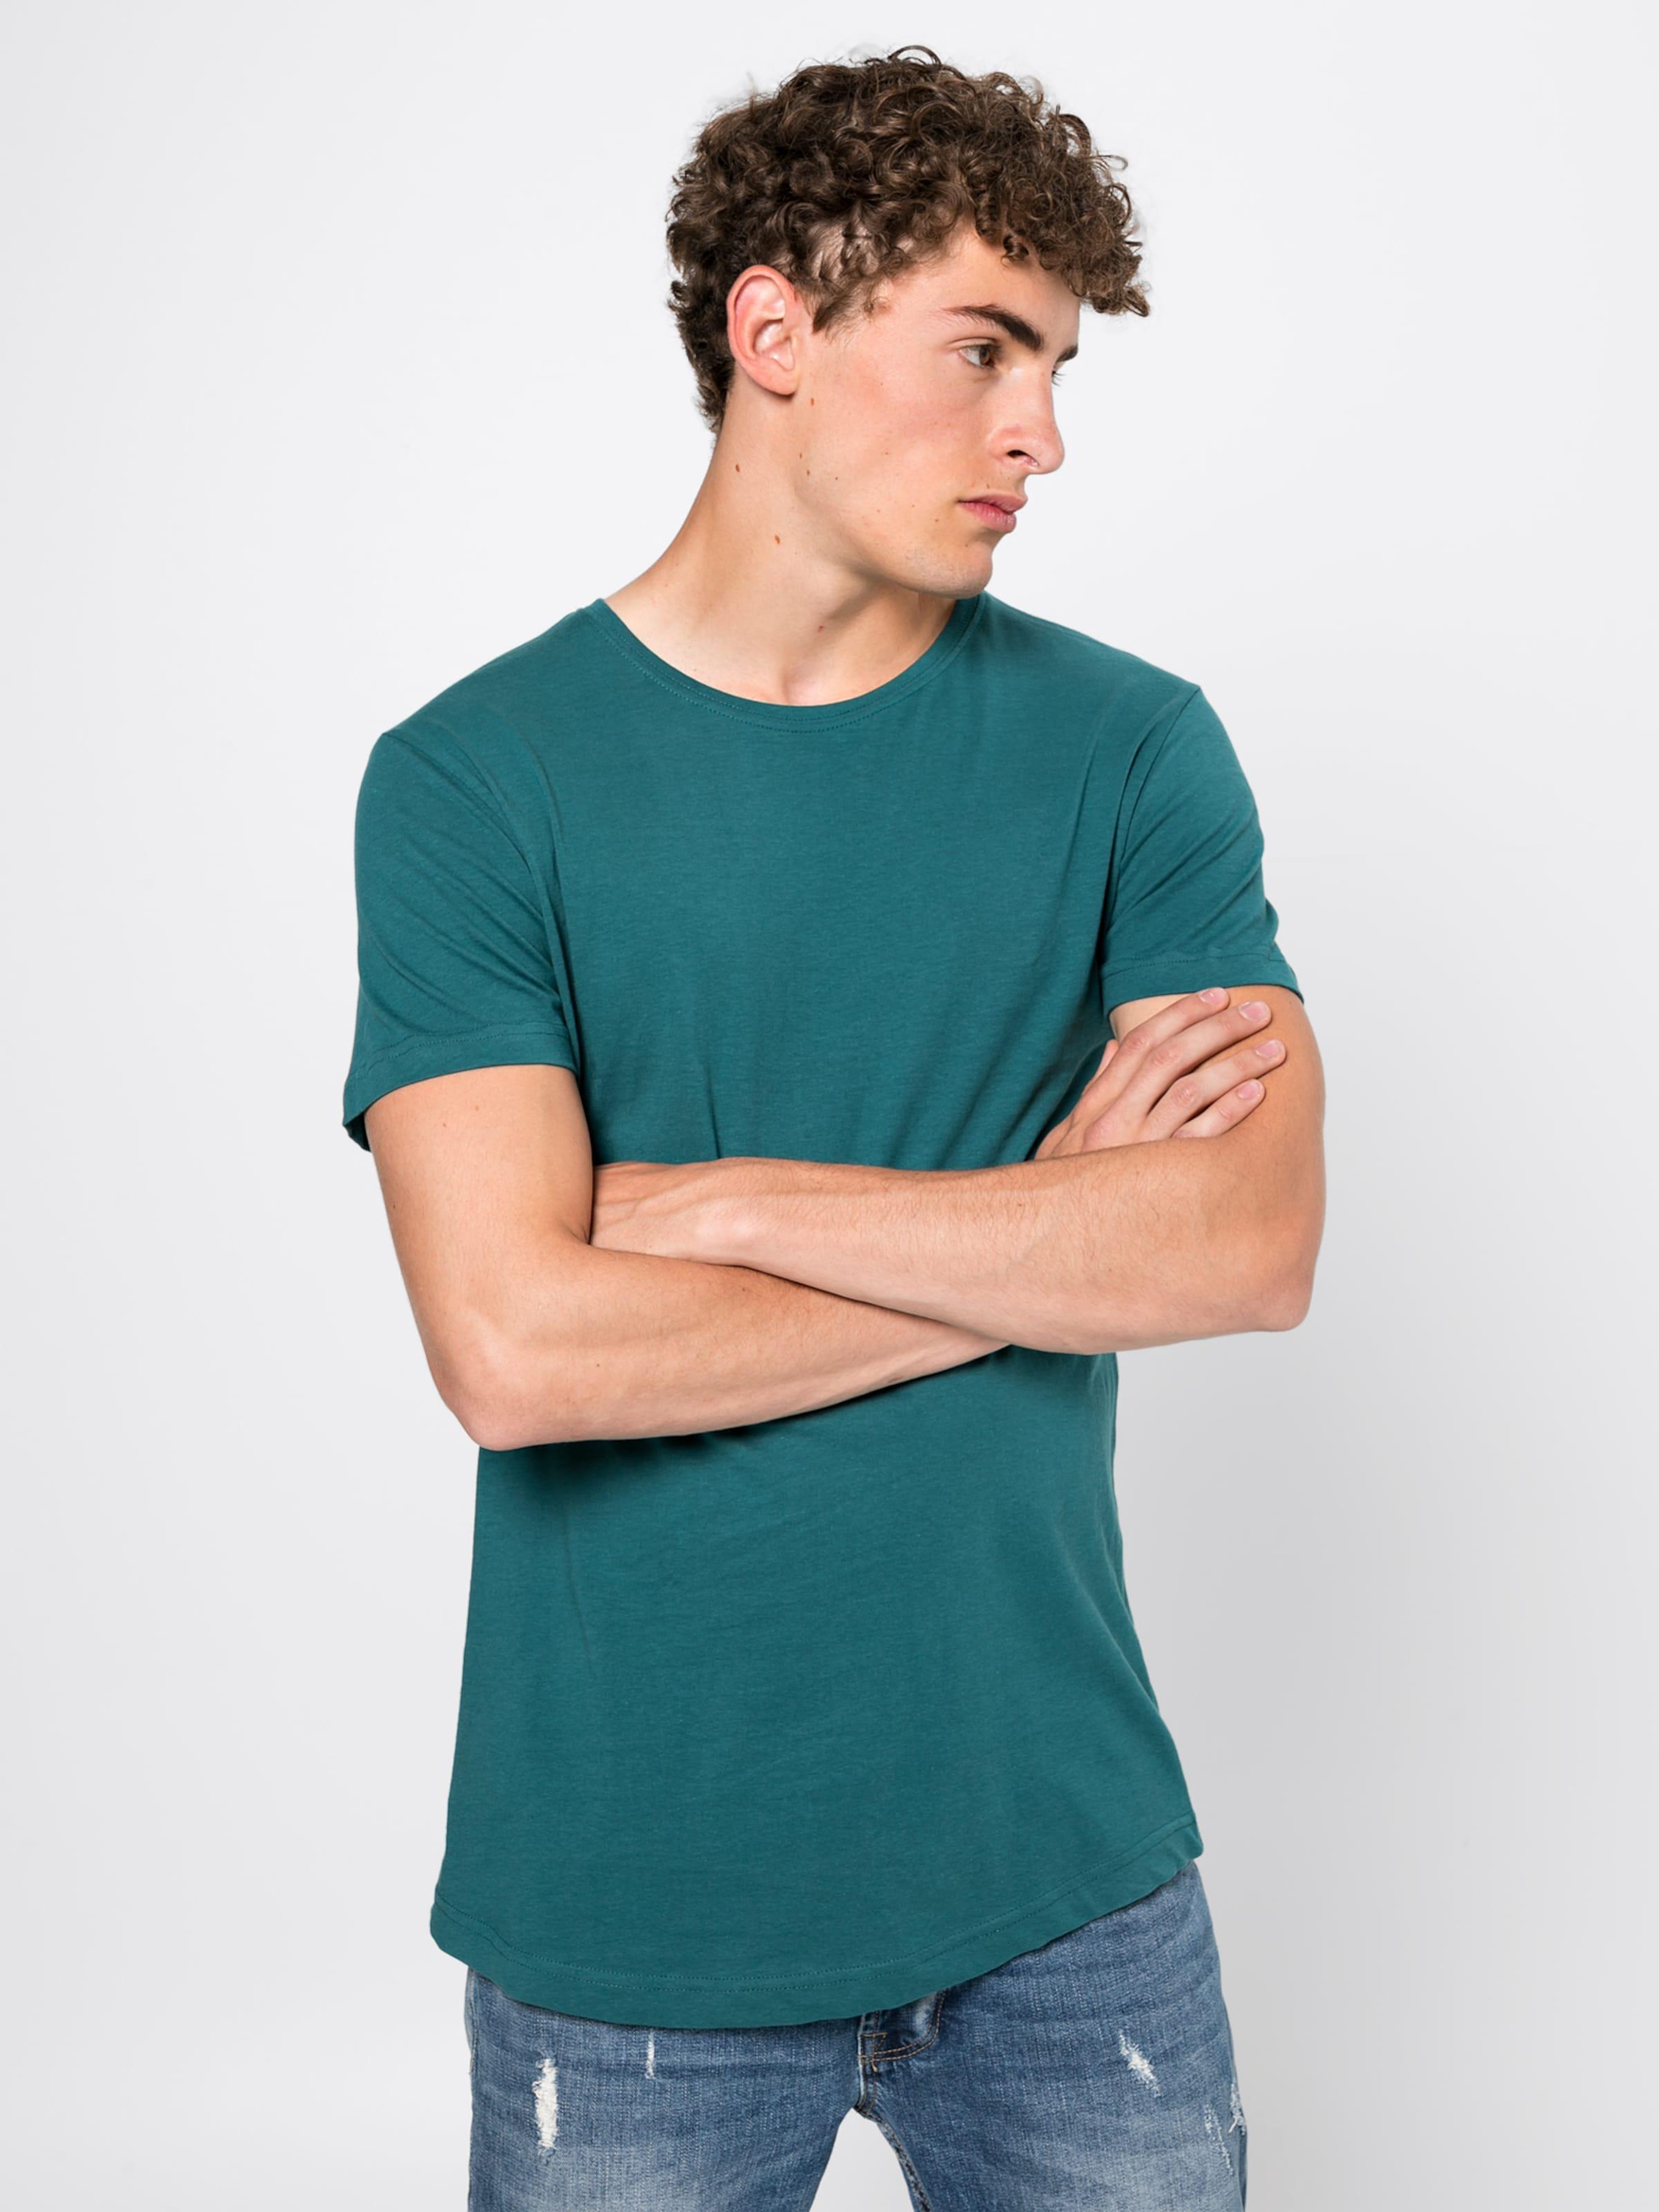 shirt T Classics En Urban Pétrole kXOZiuP